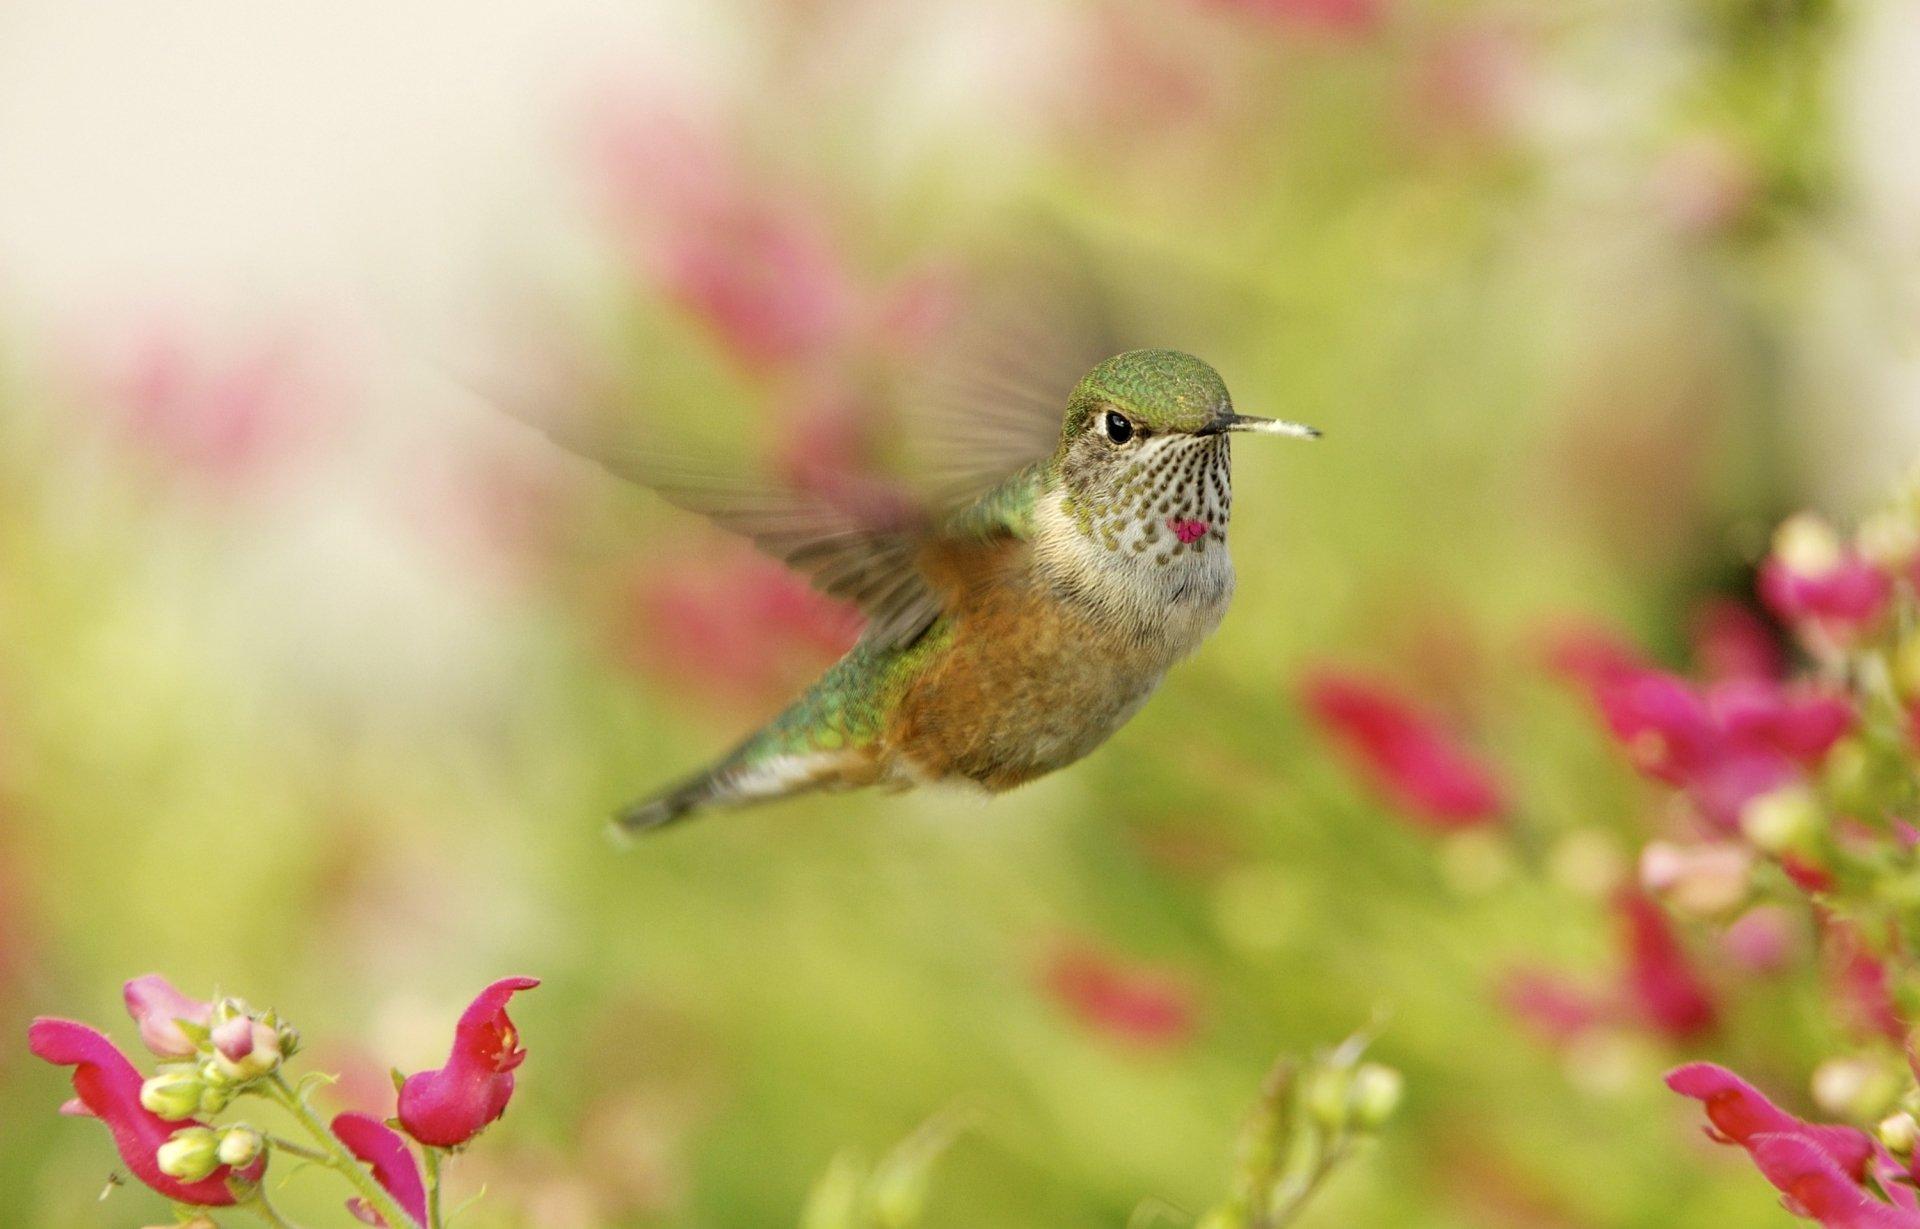 Humming bird hd wallpaper background image 3000x1920 id 531413 wallpaper abyss - 3000x1920 wallpaper ...